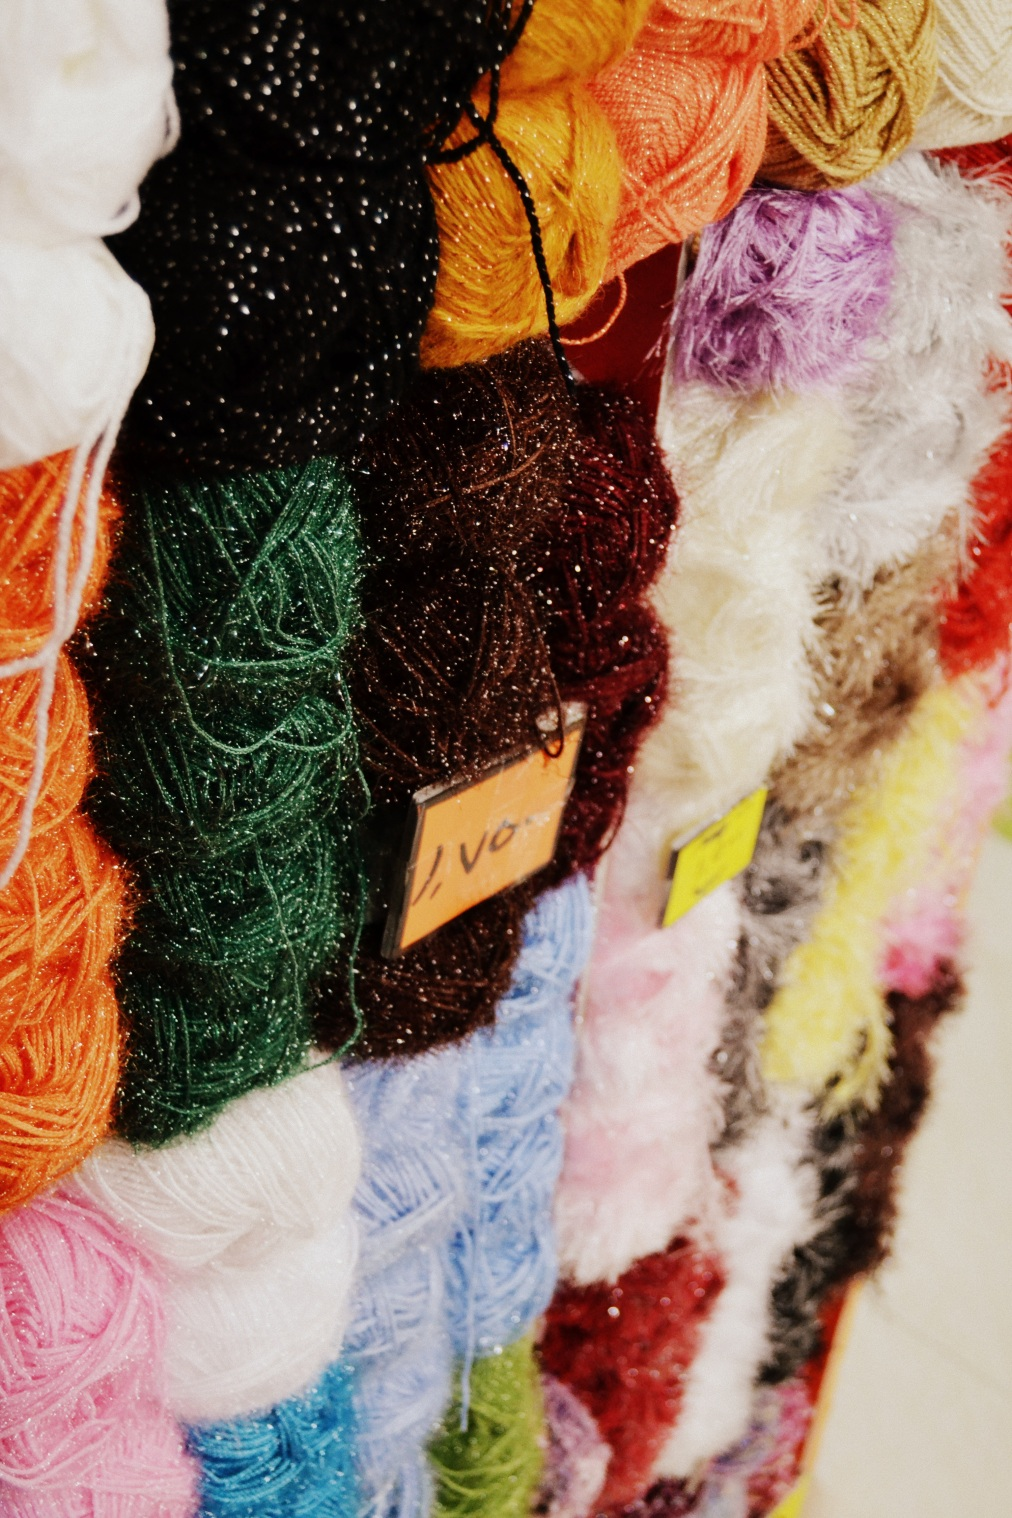 Buying Yarn InKuwait..